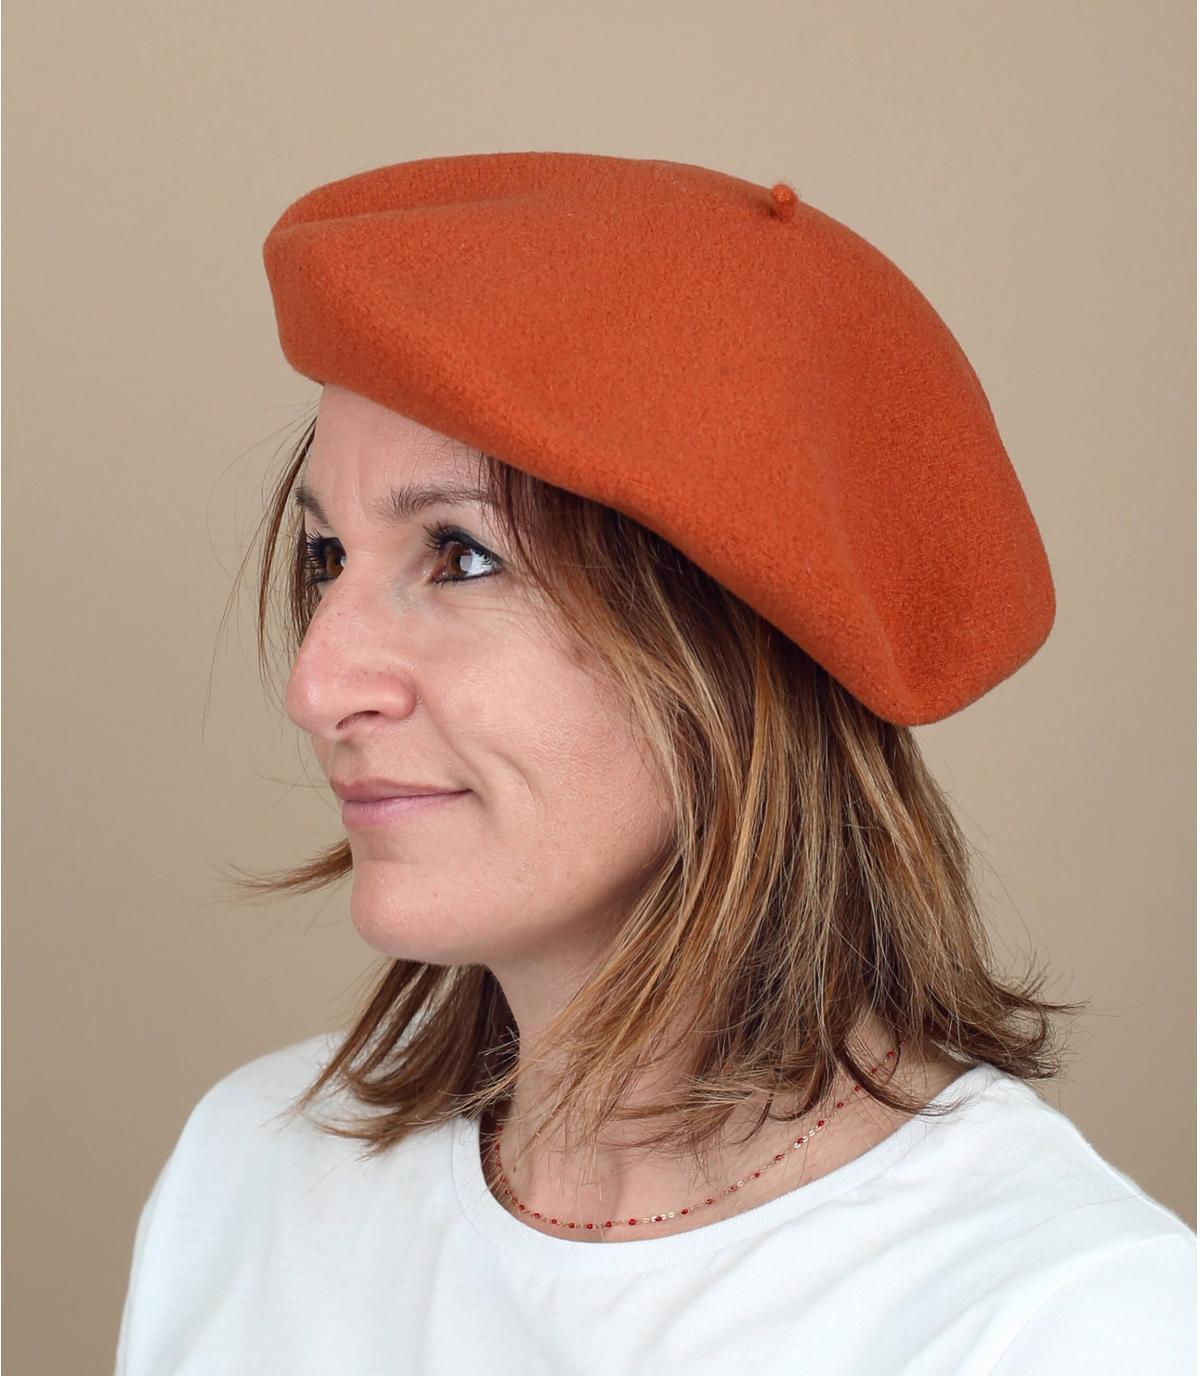 Laulhère oranje baret